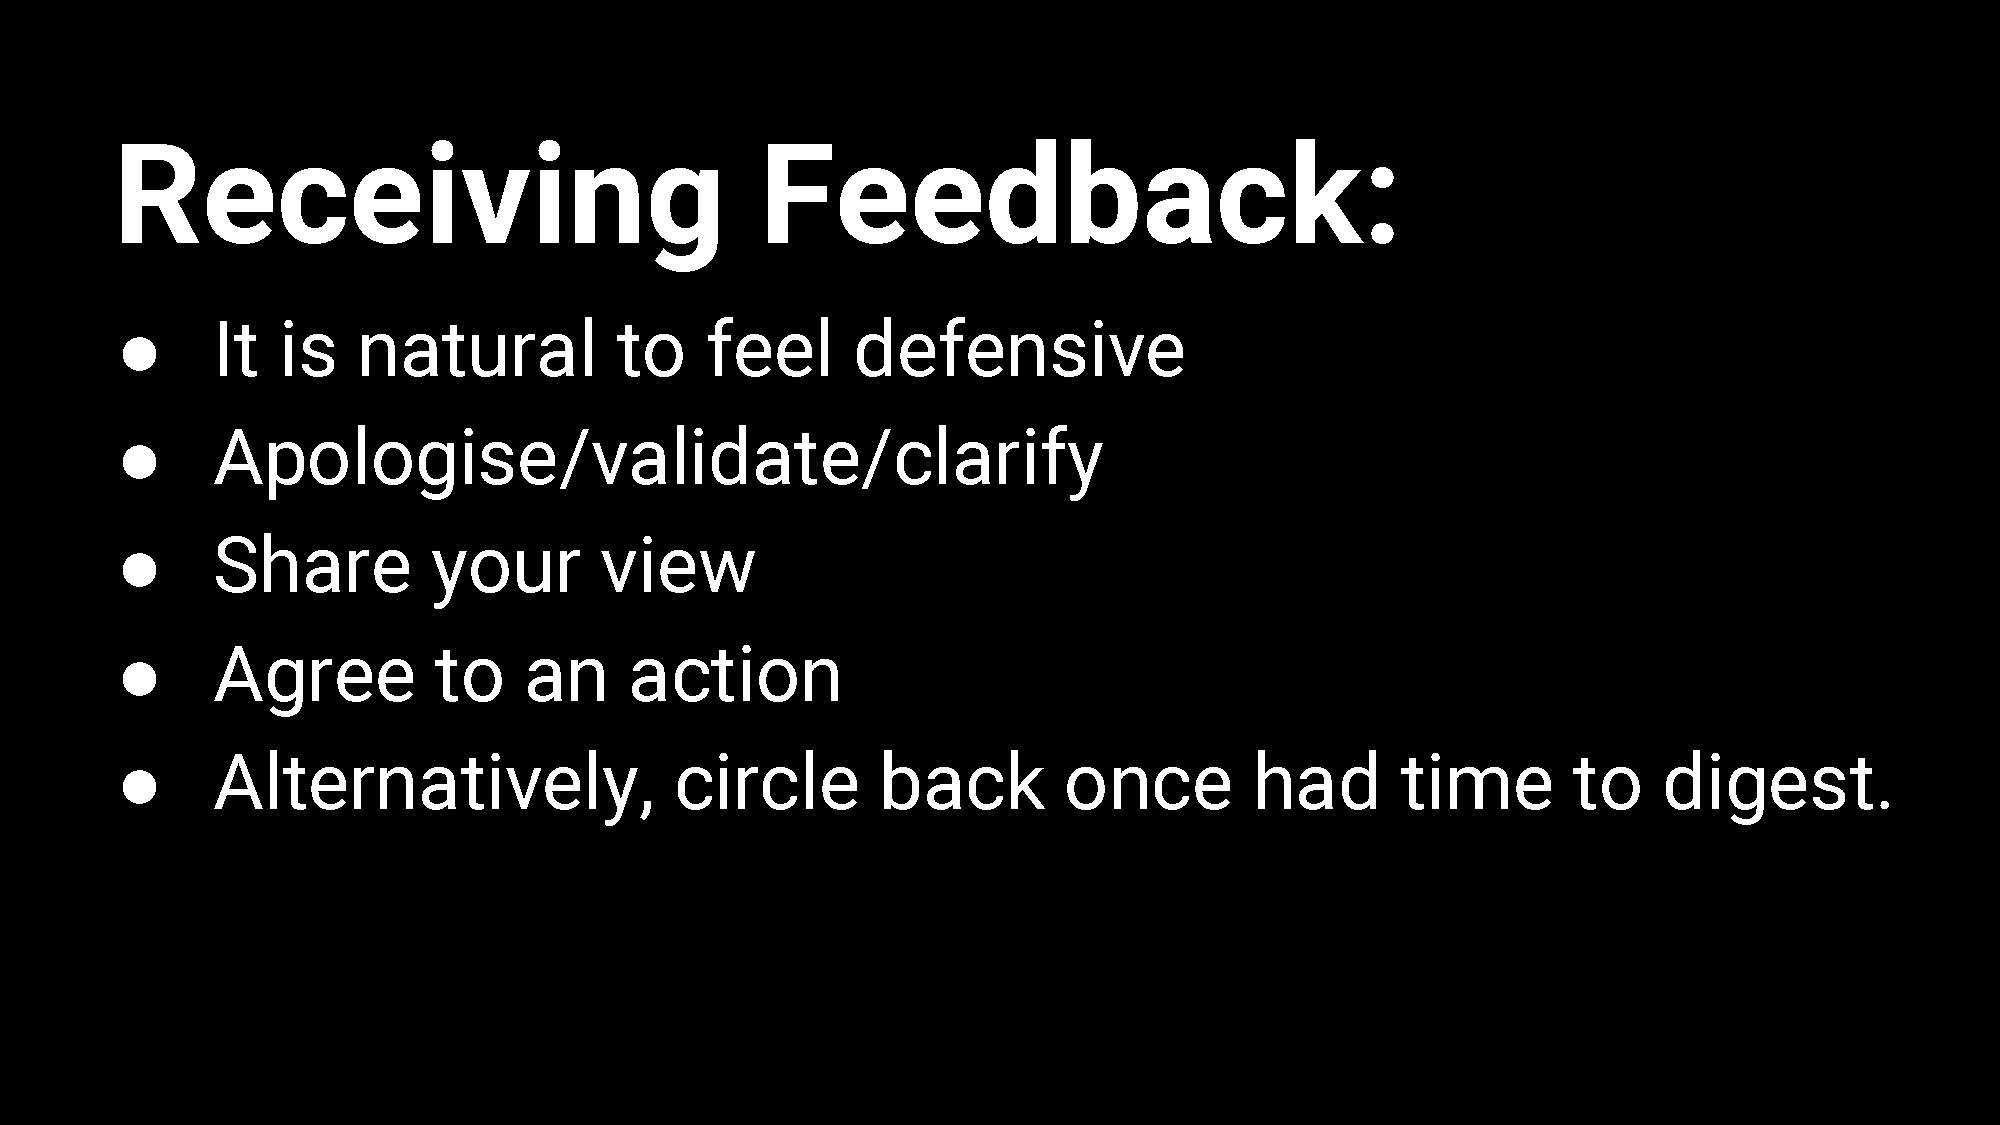 constructive feedback brisbane_Page_16.jpg